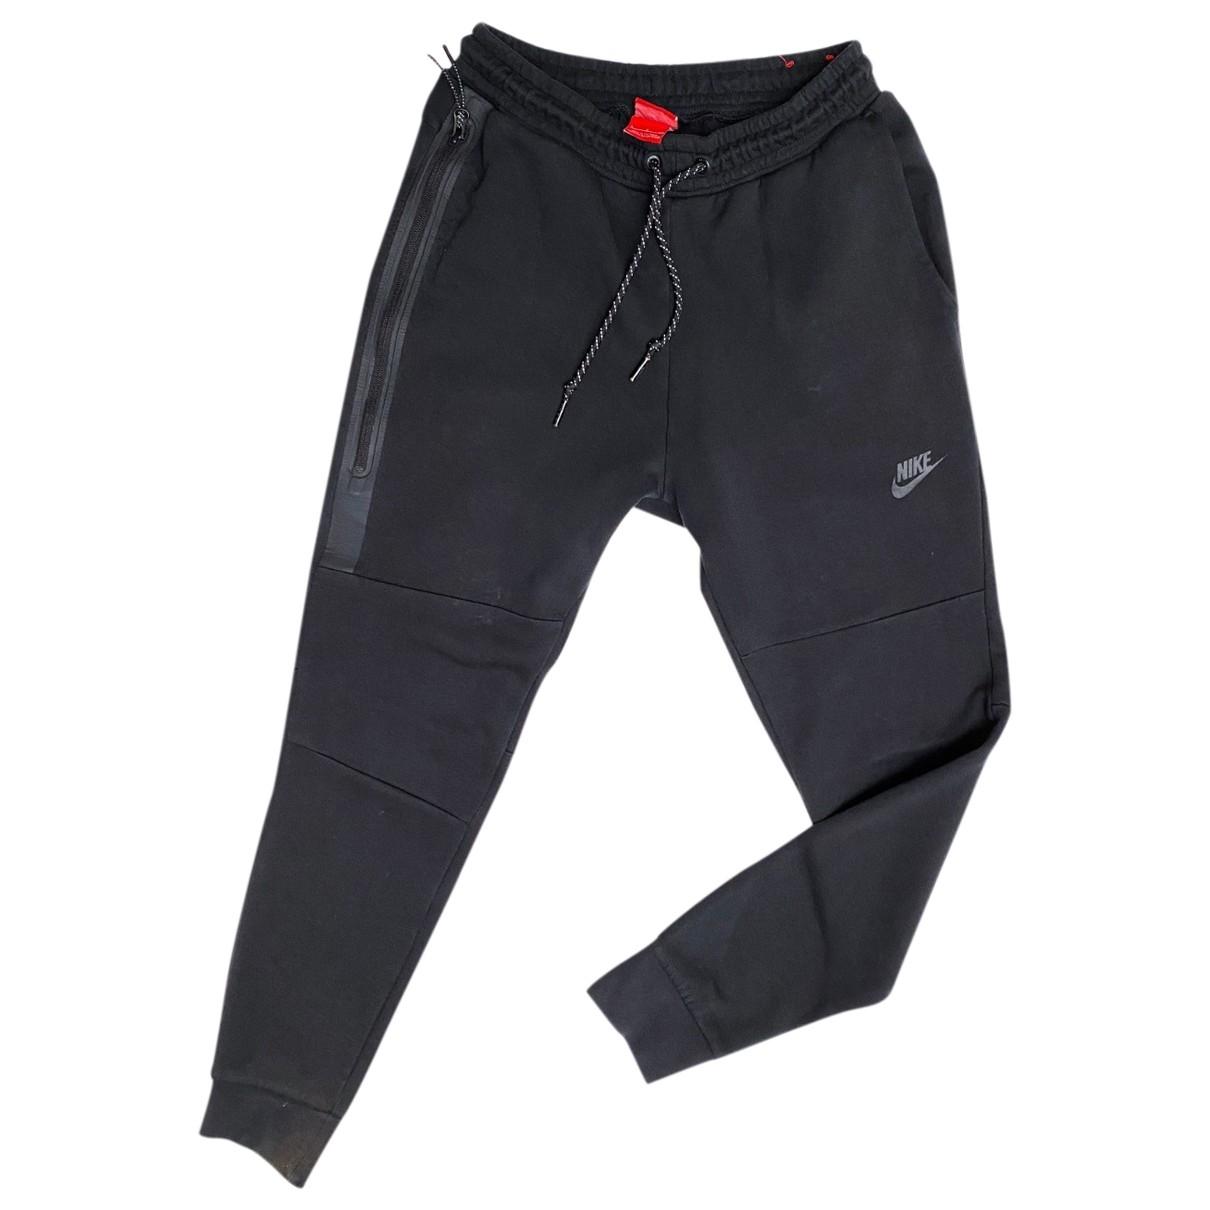 Nike \N Black Cotton Trousers for Men S International